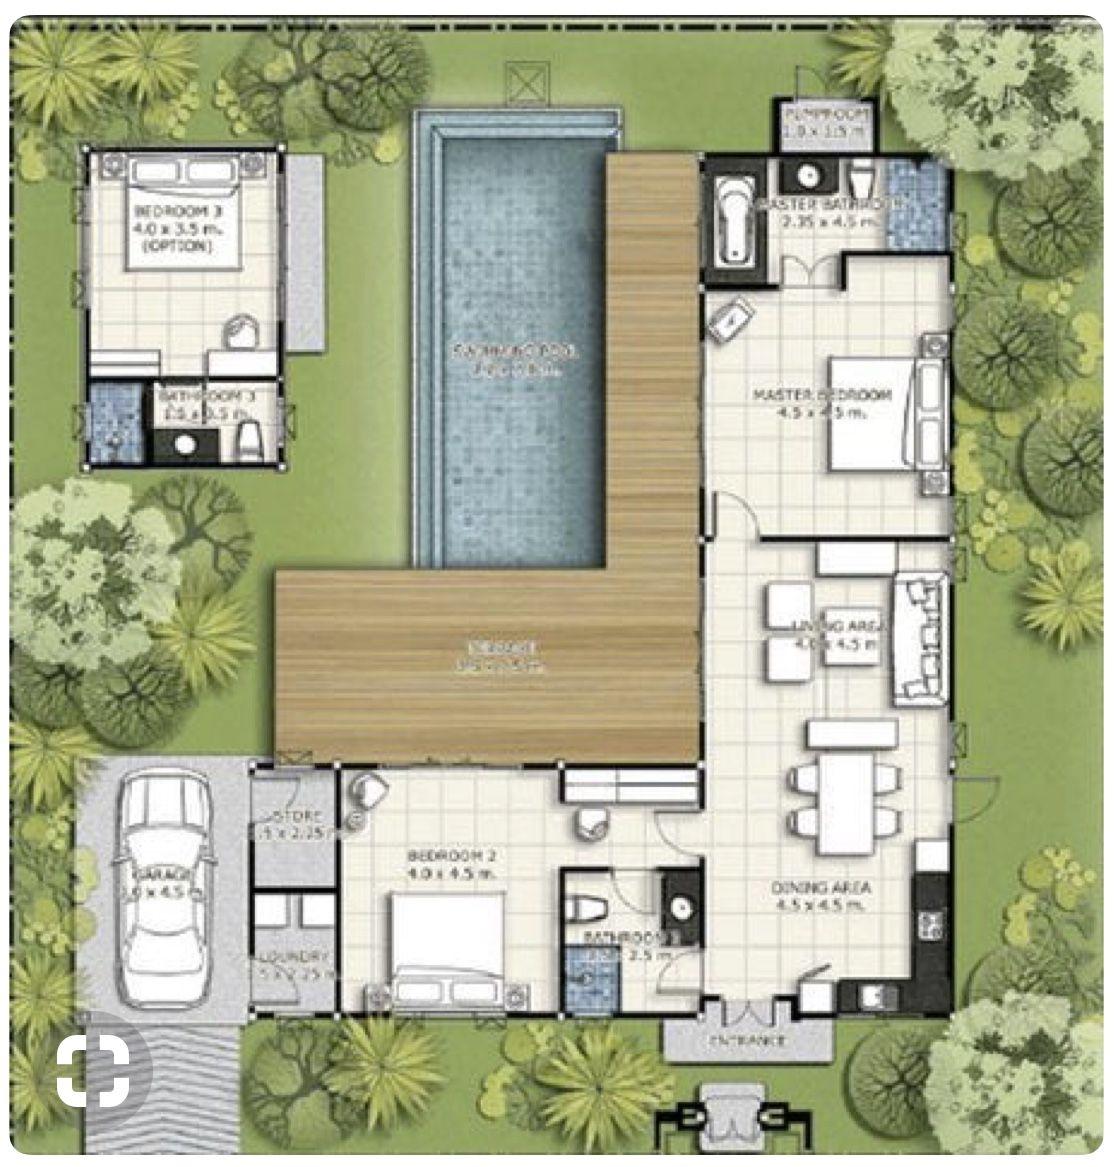 Pin By Regina Funcke On Villa V Tulum Design Ideas Bali House Container House Design Small House Design